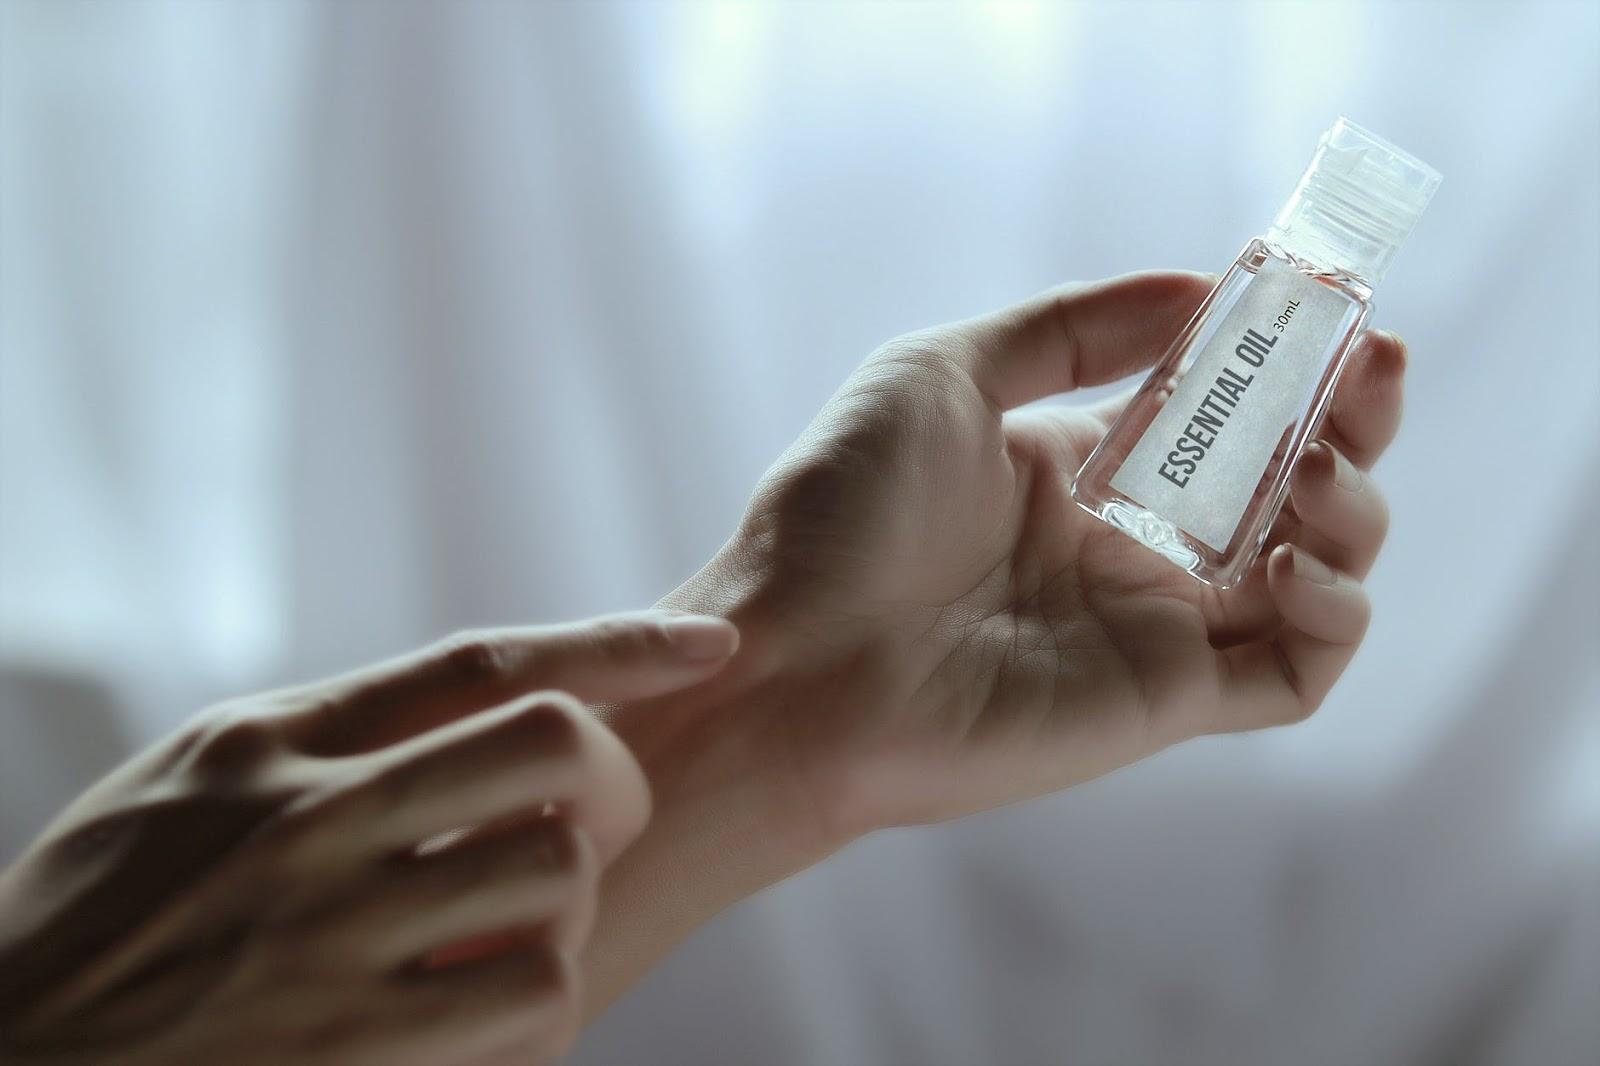 pregnant woman applying essential oil